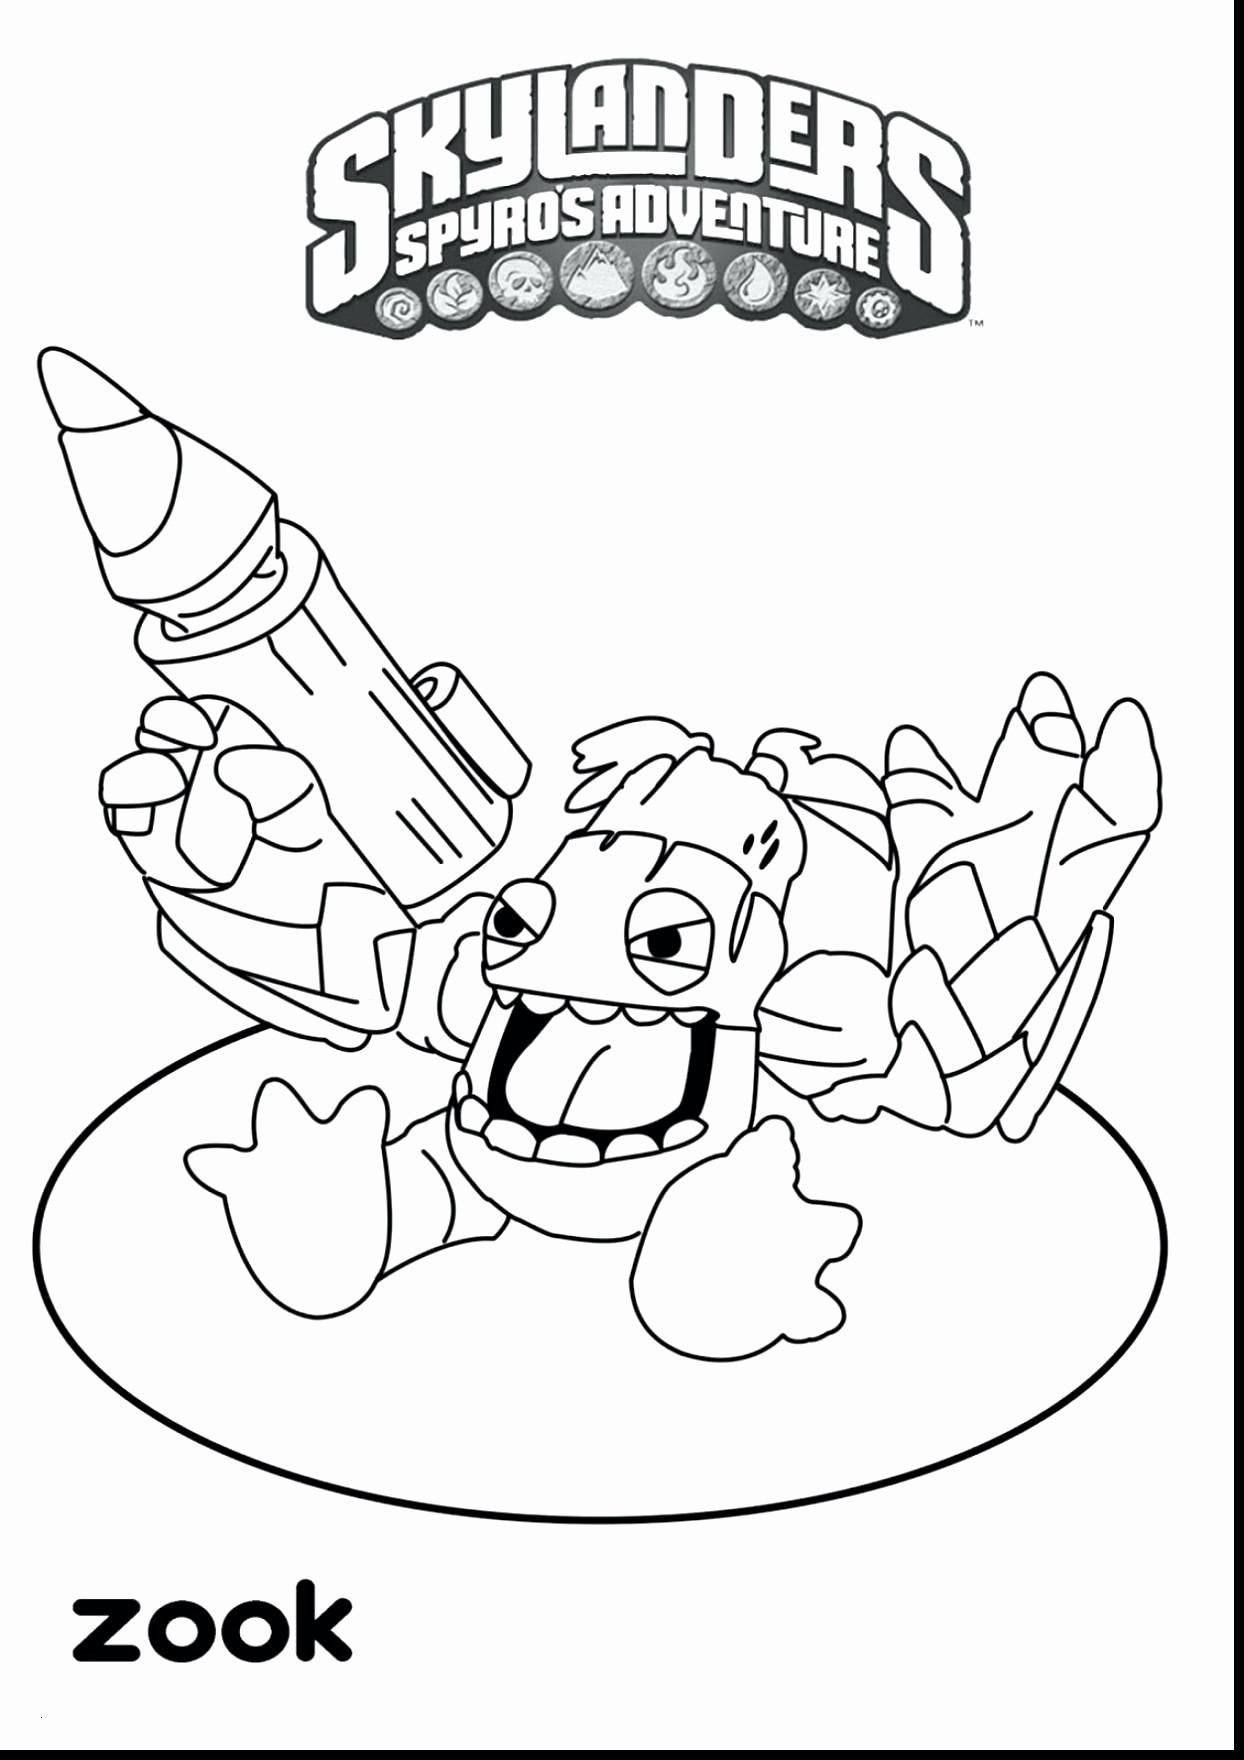 Spongebob Zum Ausmalen Einzigartig Baby Spongebob Squarepants Coloring Pages Coloring Pages Genial Bild